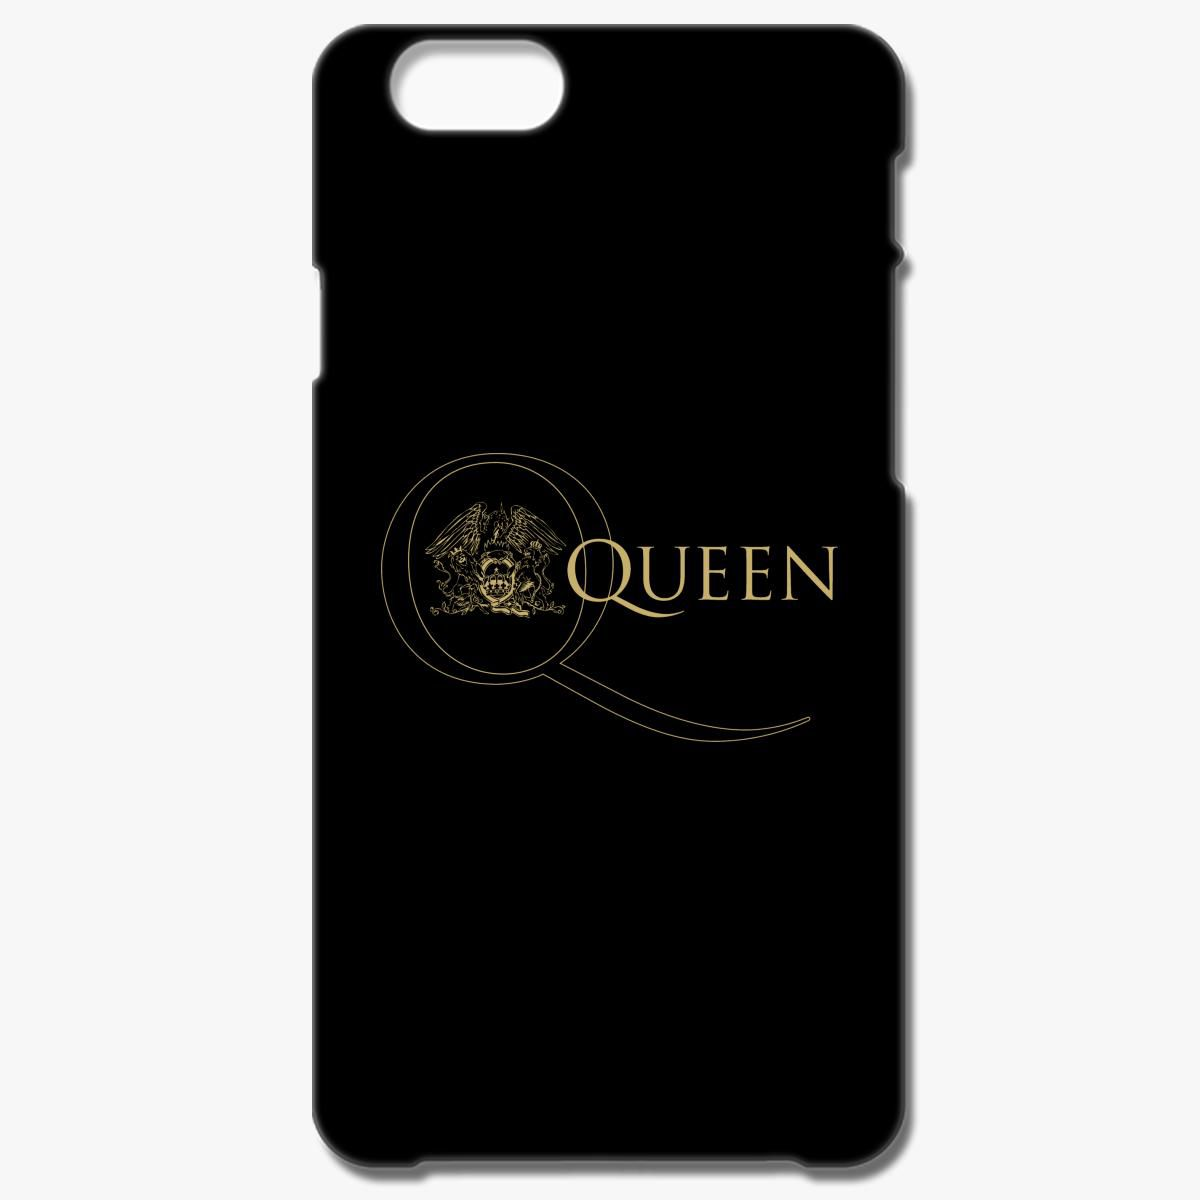 new arrival 75bc6 9b5e1 Queen iPhone 6/6S Plus Case - Customon